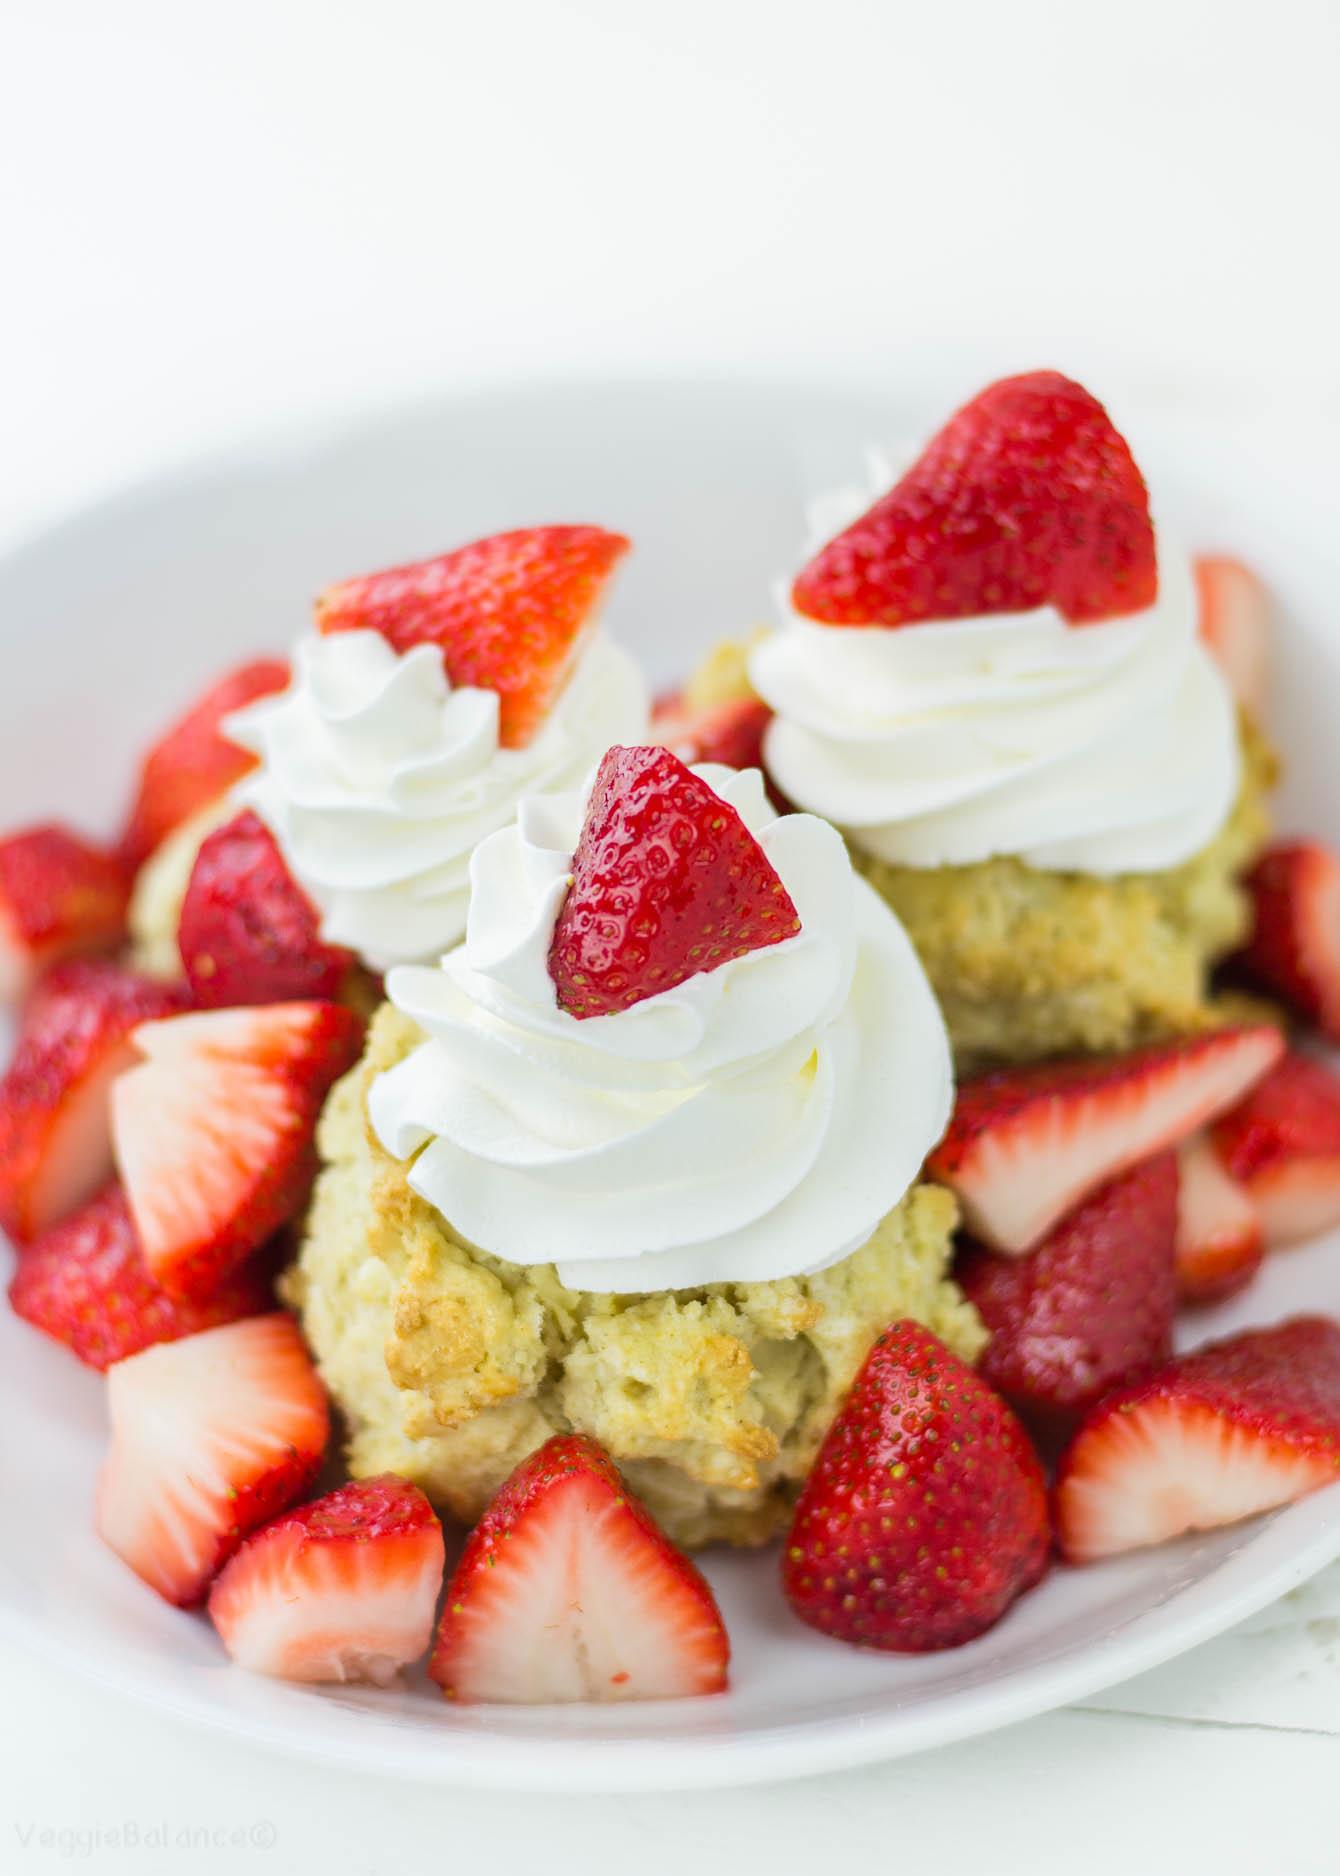 Gluten Free Strawberry Shortcake recipe Gluten Free - veggiebalance.com